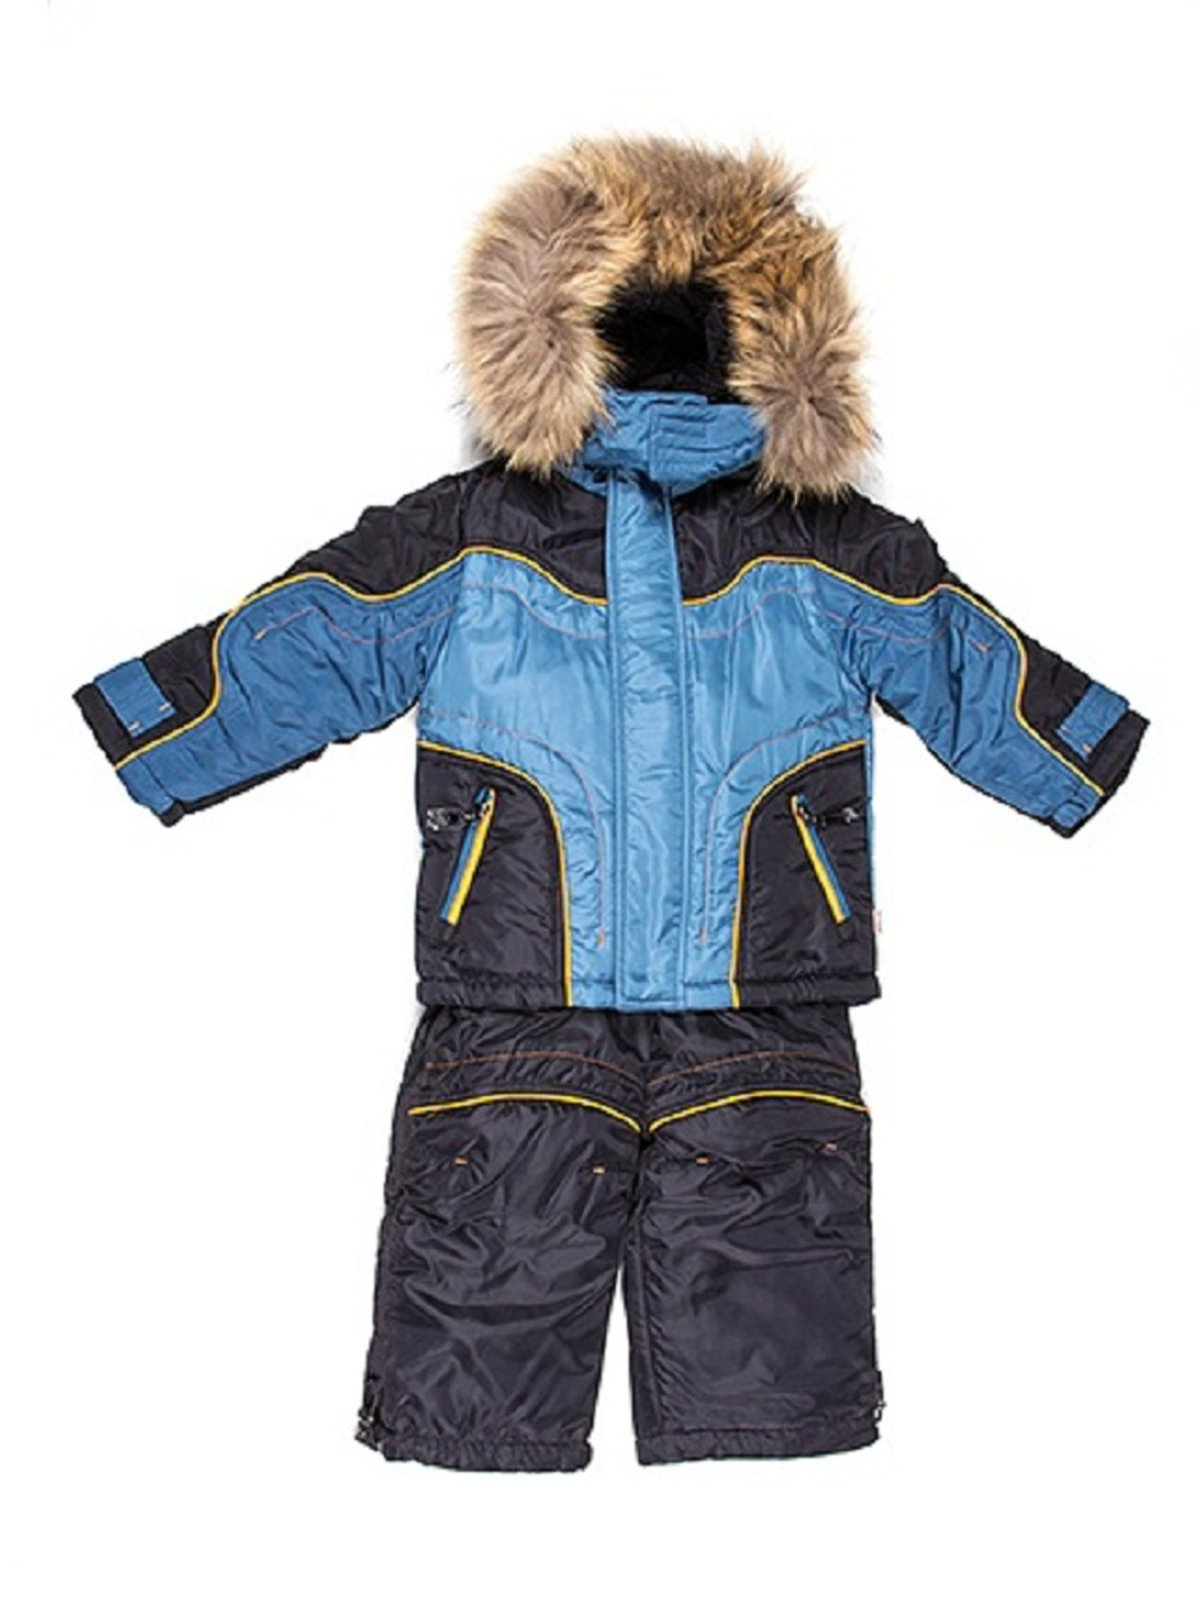 Комплект: куртка и полукомбинезон | 697506